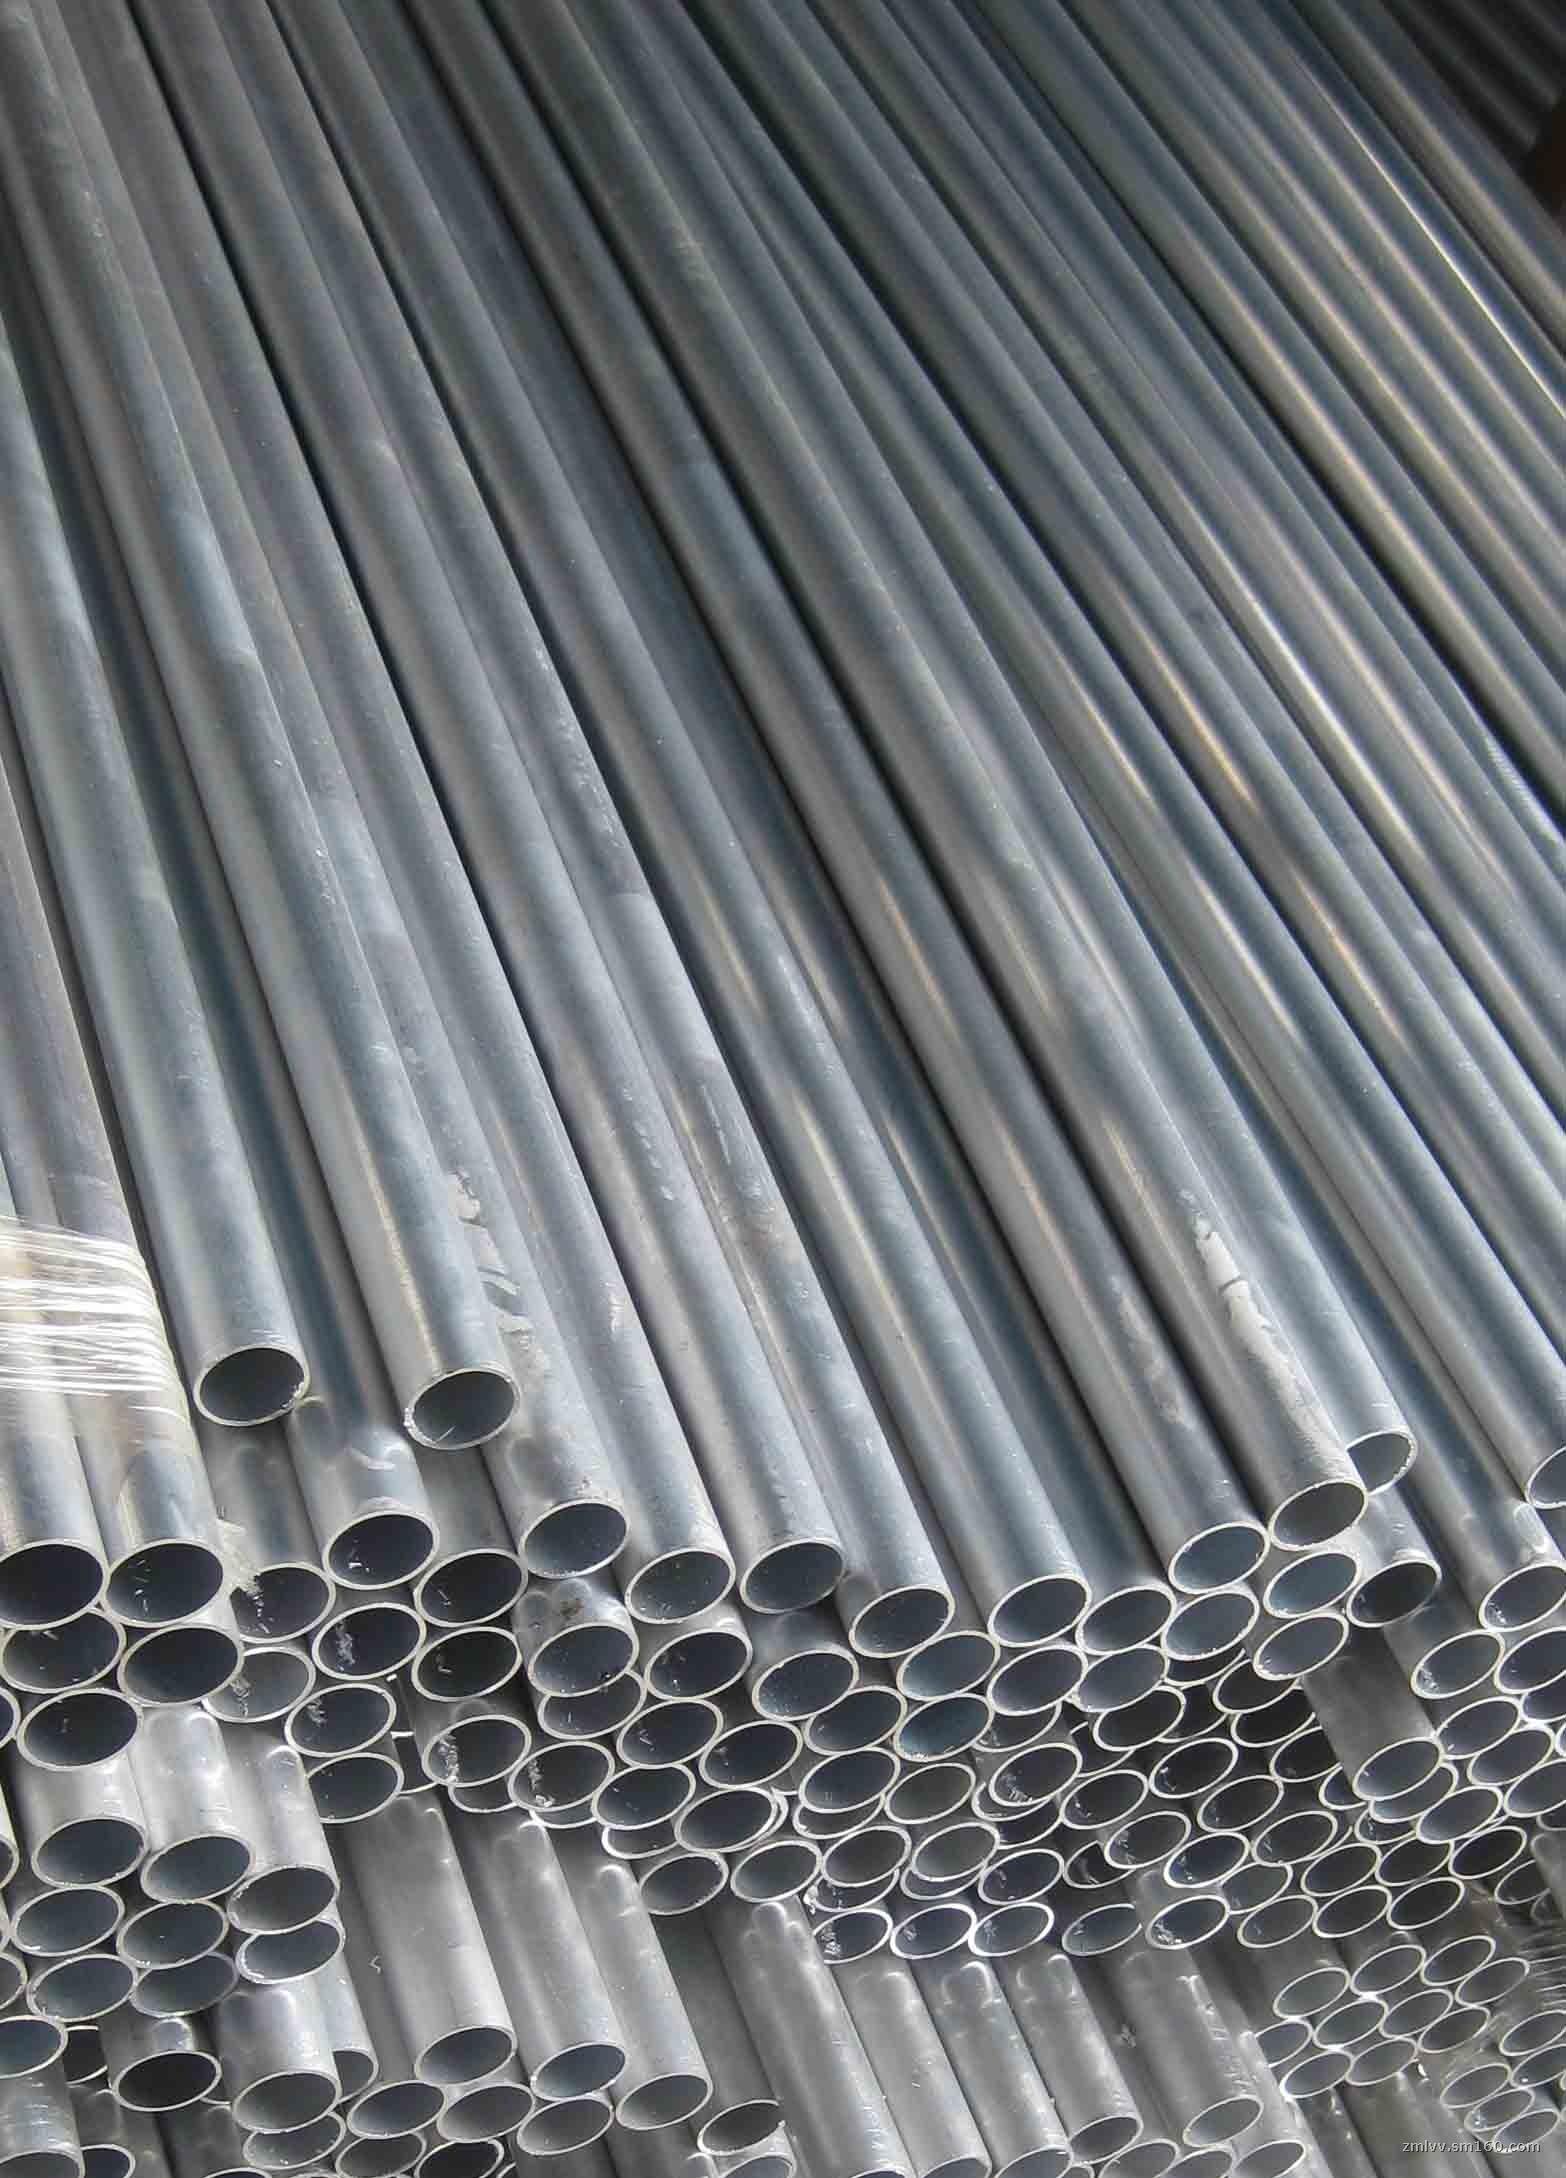 Square, Round, Different Aluminium Alloy Extrusion Profile for Door and Window Tube